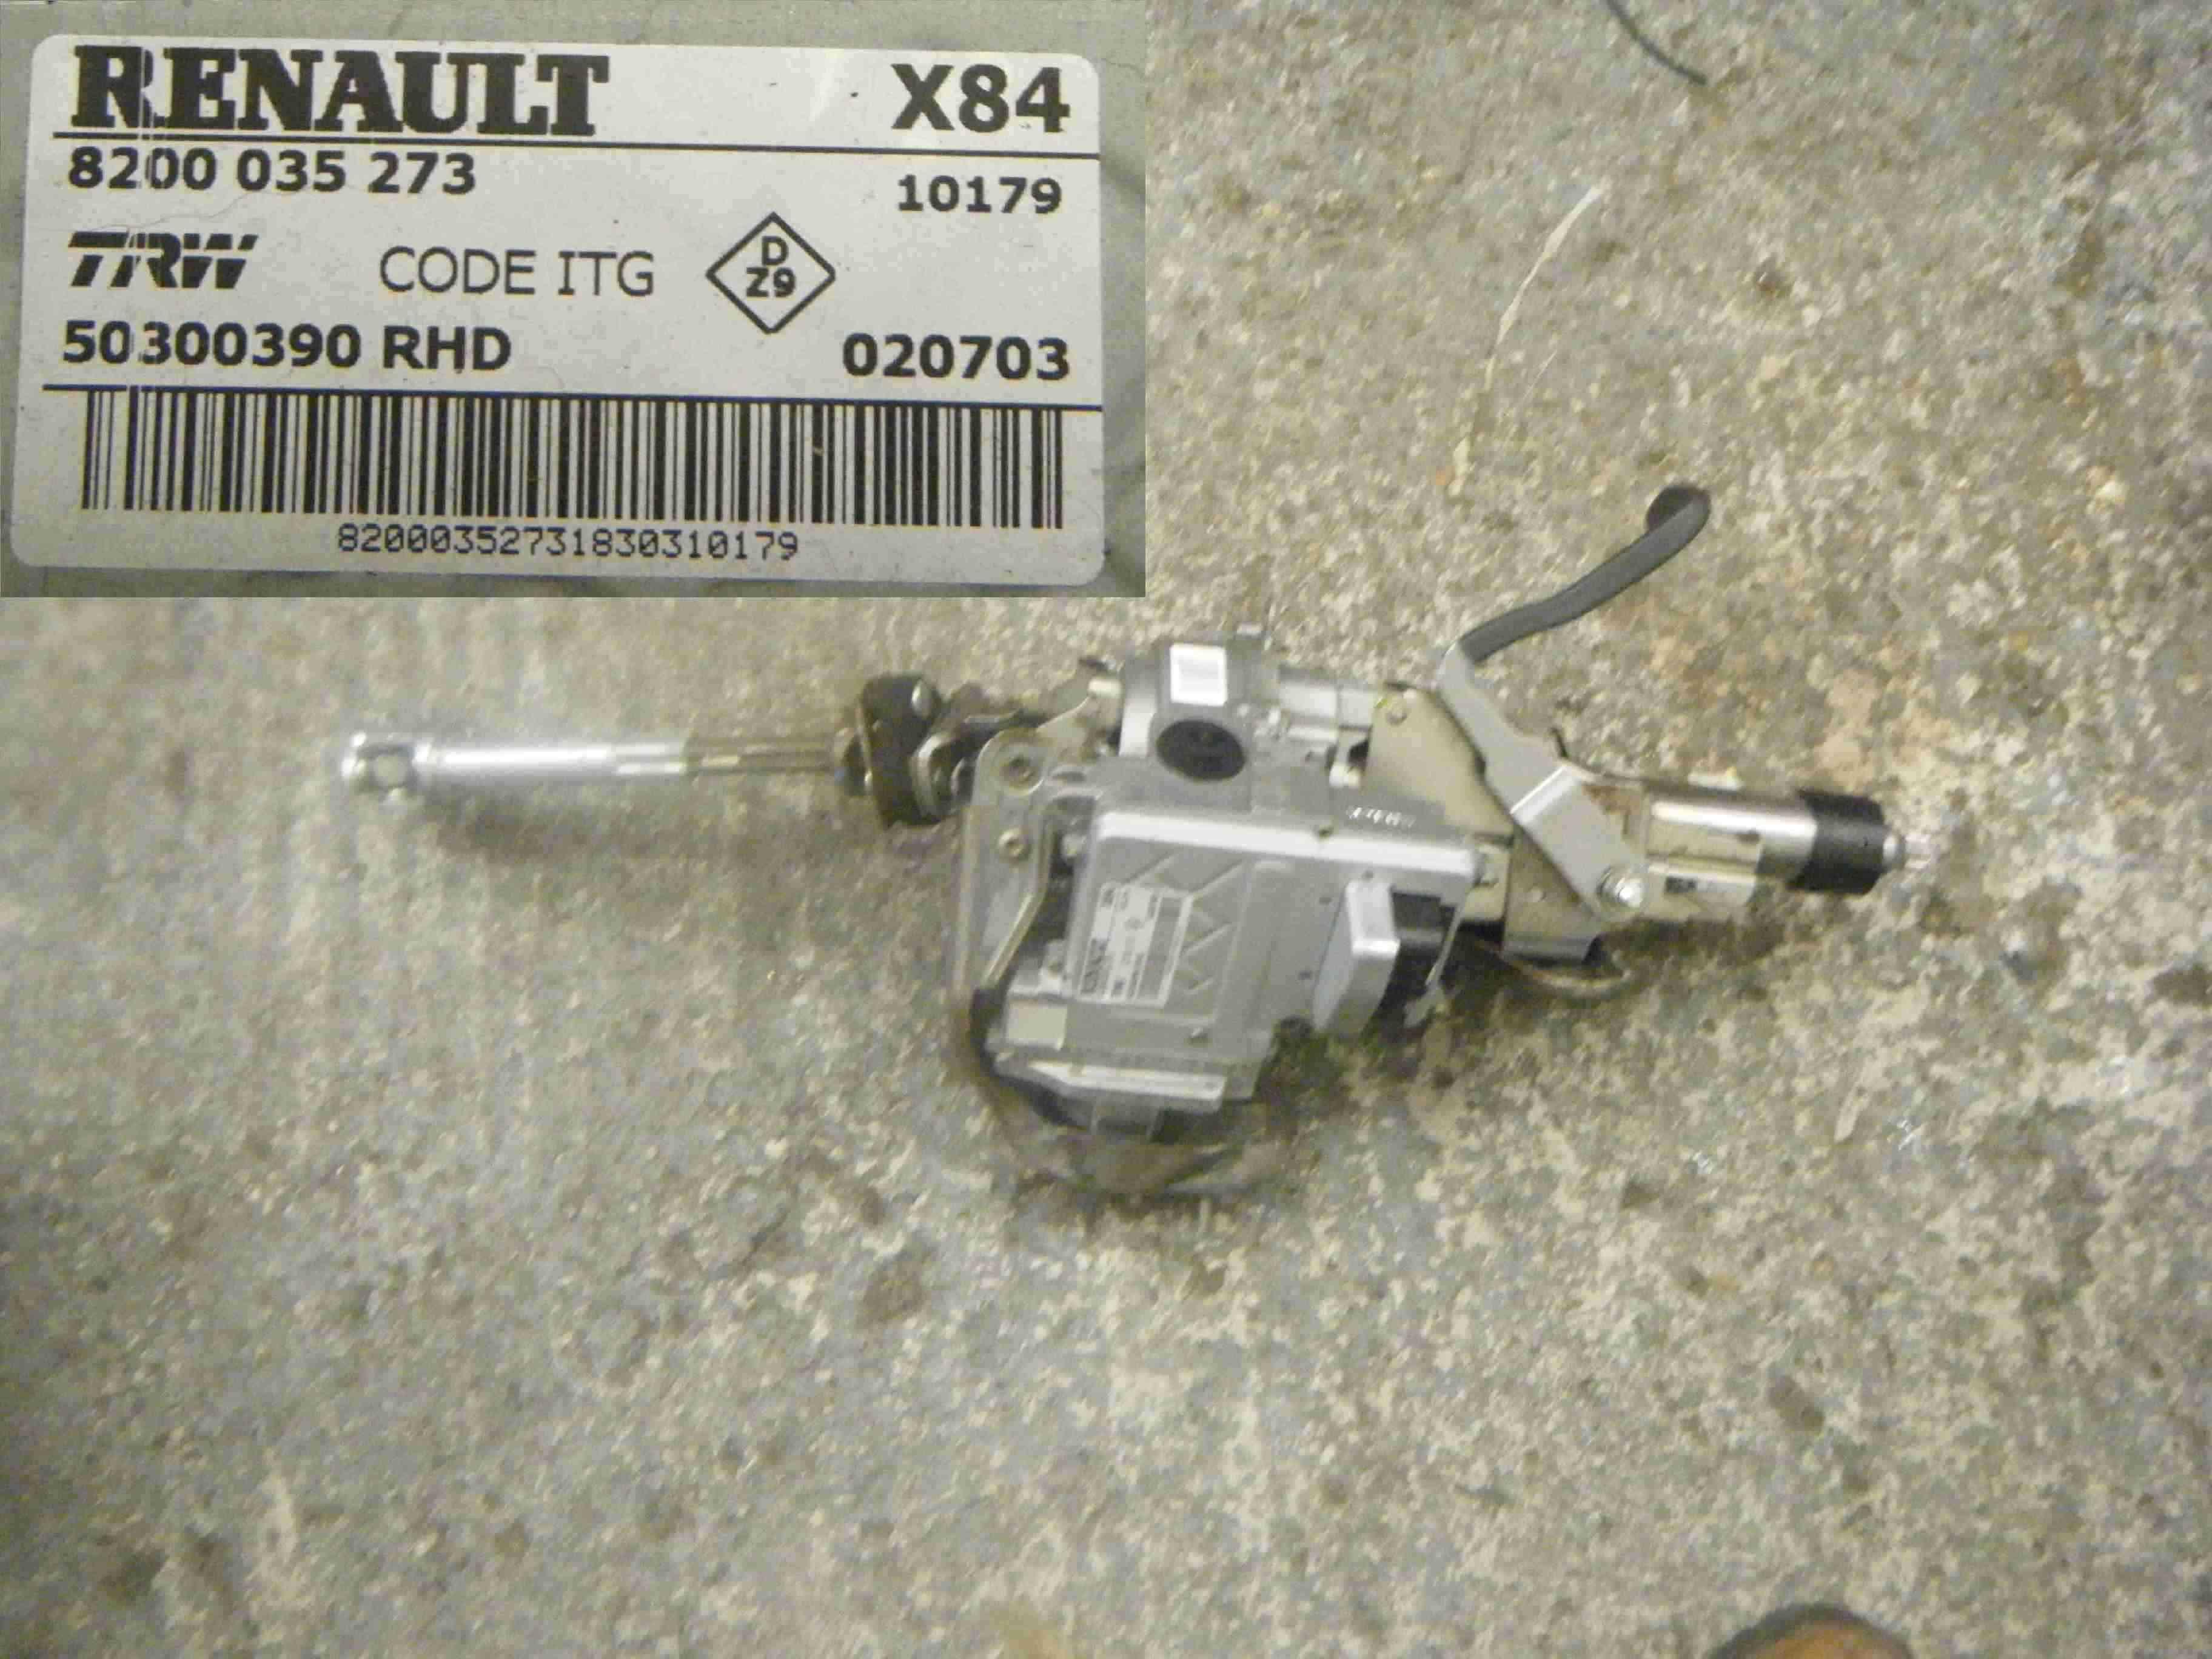 Renault Megane Scenic 2003-2009 Steering Column Electic Motor + ECU Unit